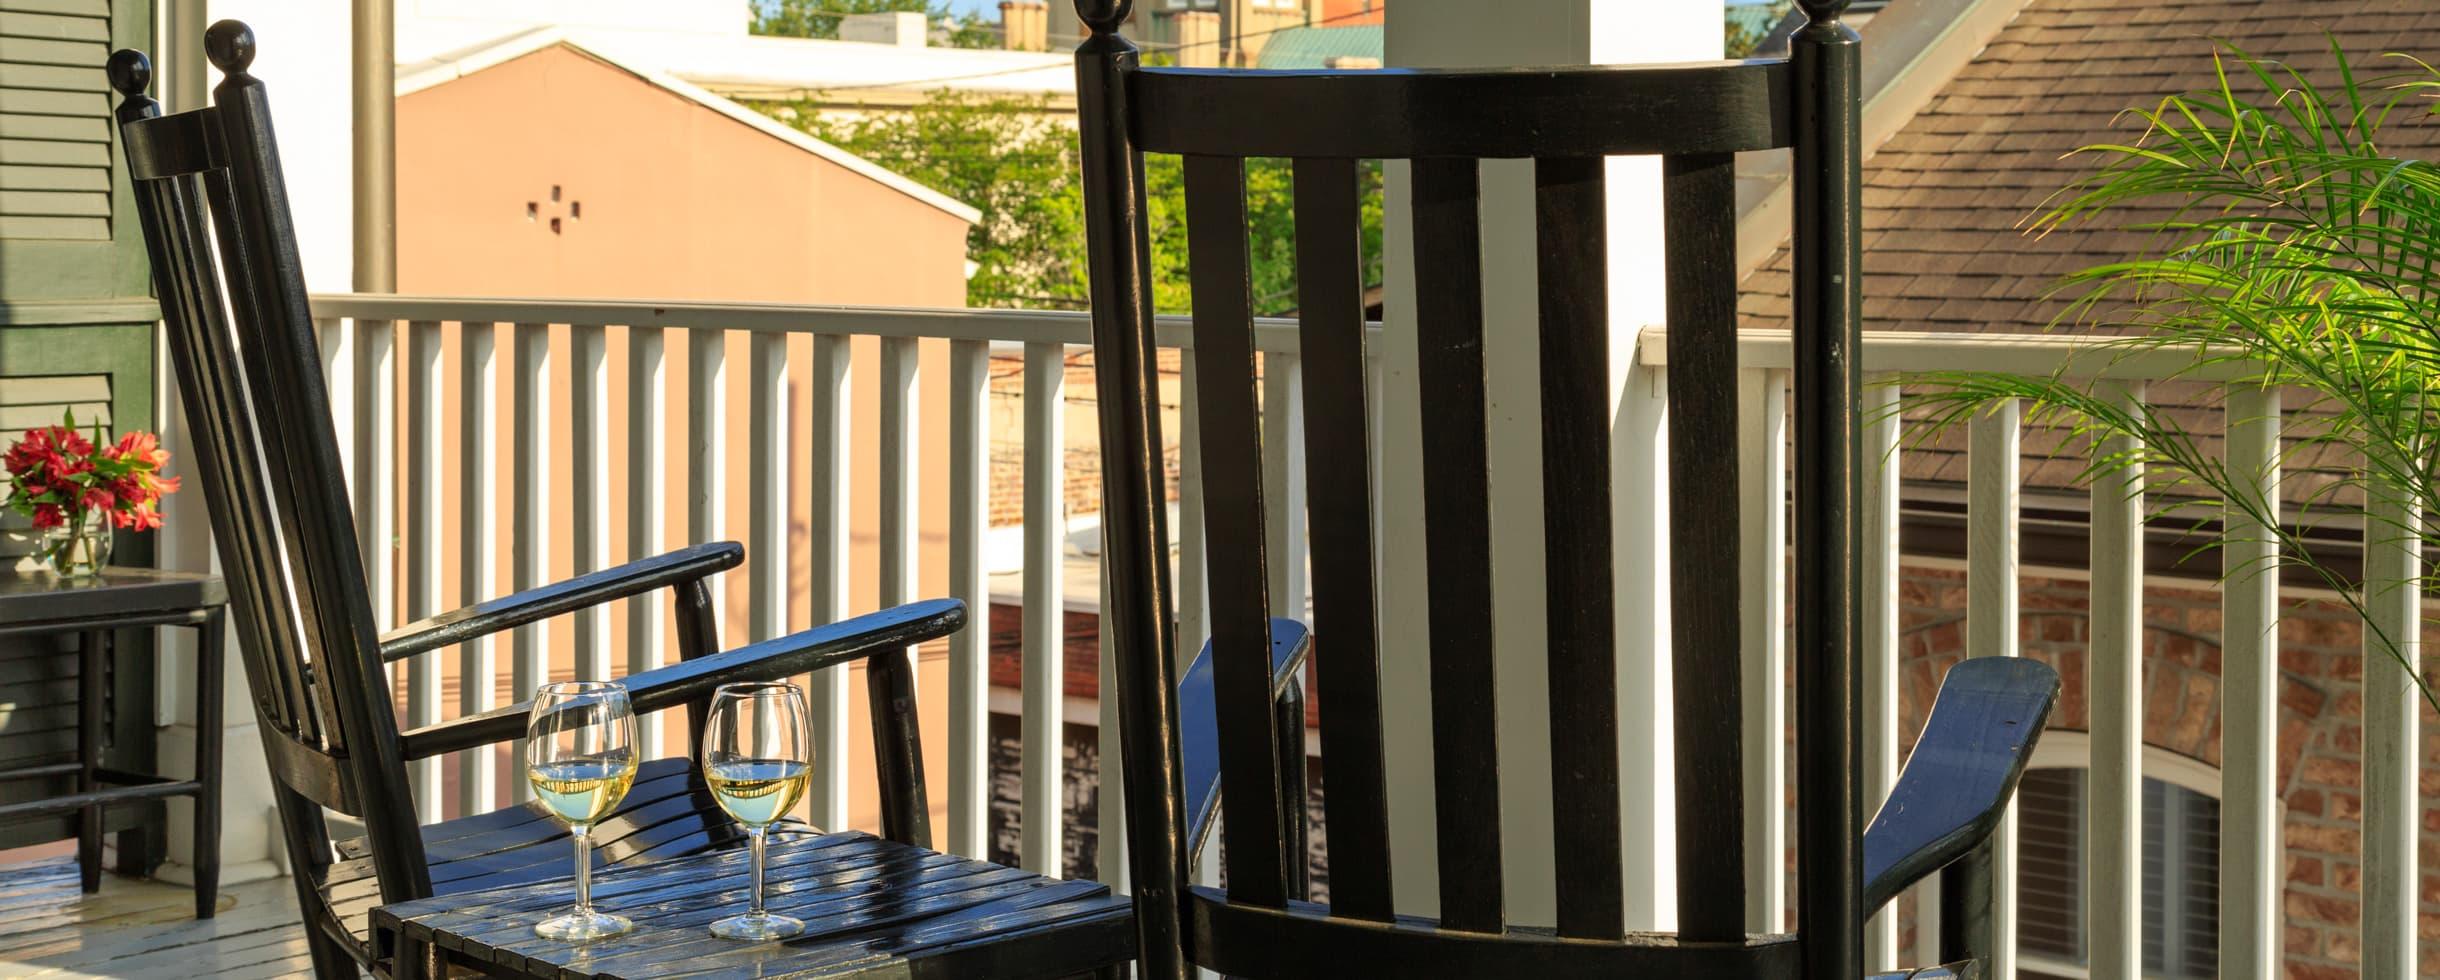 Two rocking chairs on a balcony overlooking Savannah, GA